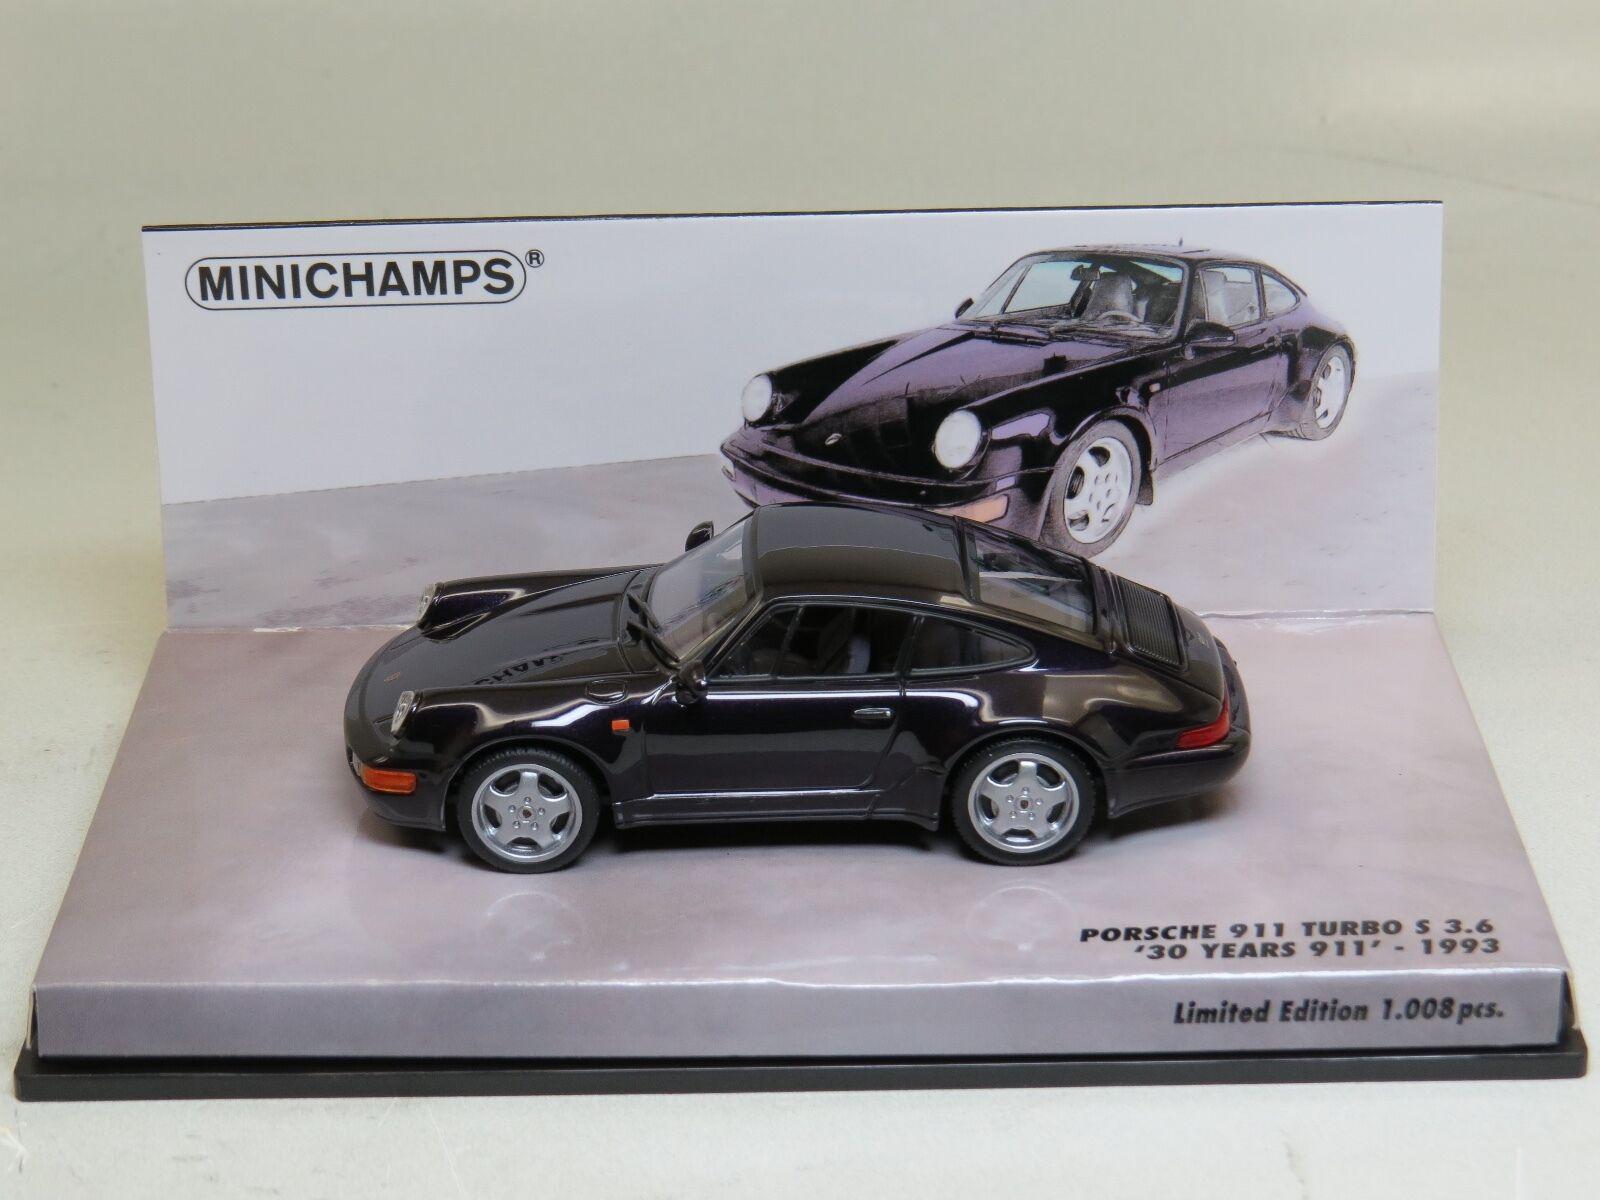 Porsche 911 Turbo S 3.6 Minichamps 1 43 Very rare    (30 years 911)